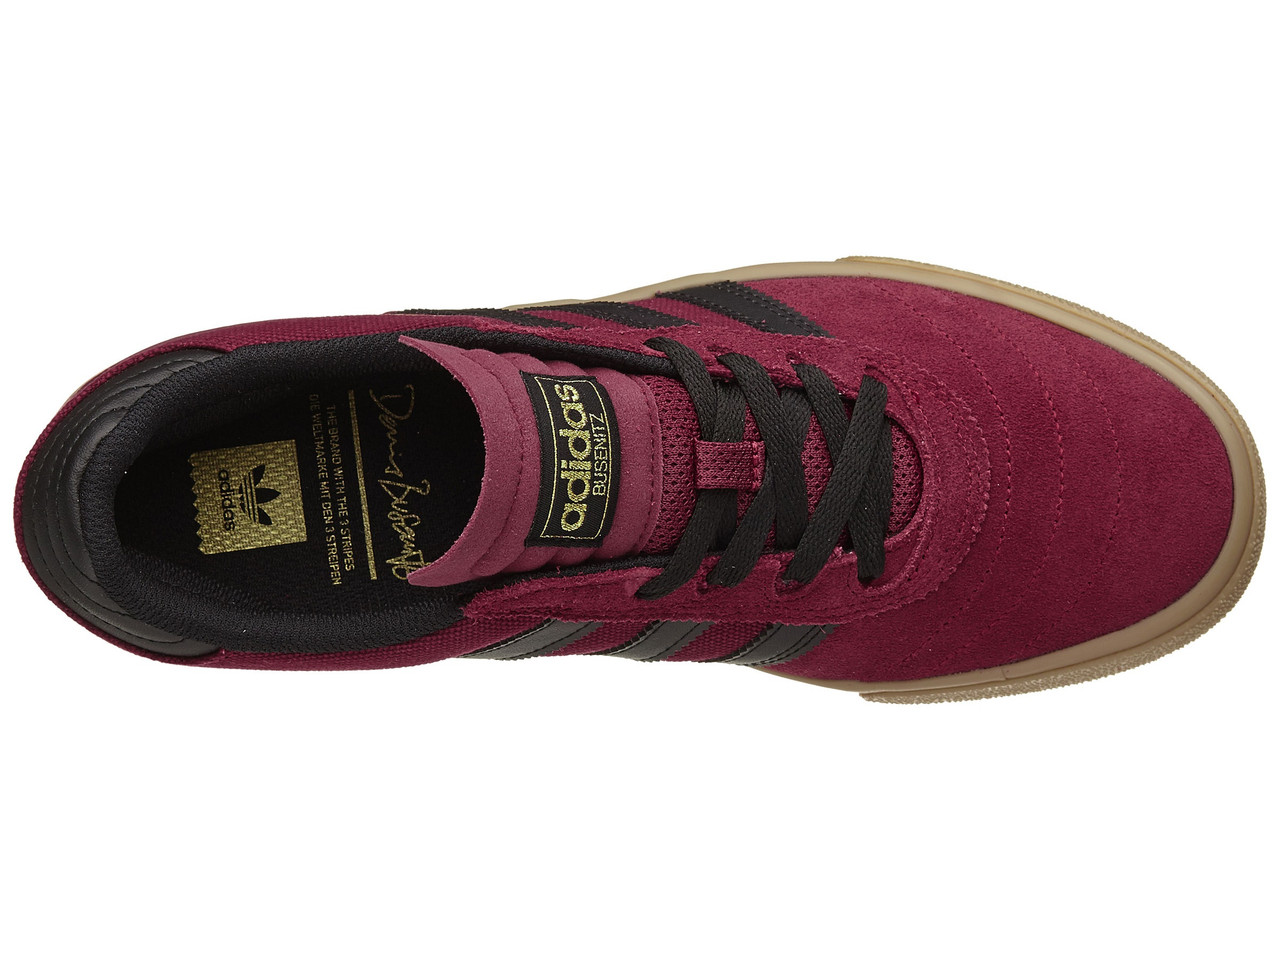 buy popular dfb71 c25a0 Adidas Busenitz Vulc Pro Skate Shoes Burgundy Black Gum   Boardparadise.com